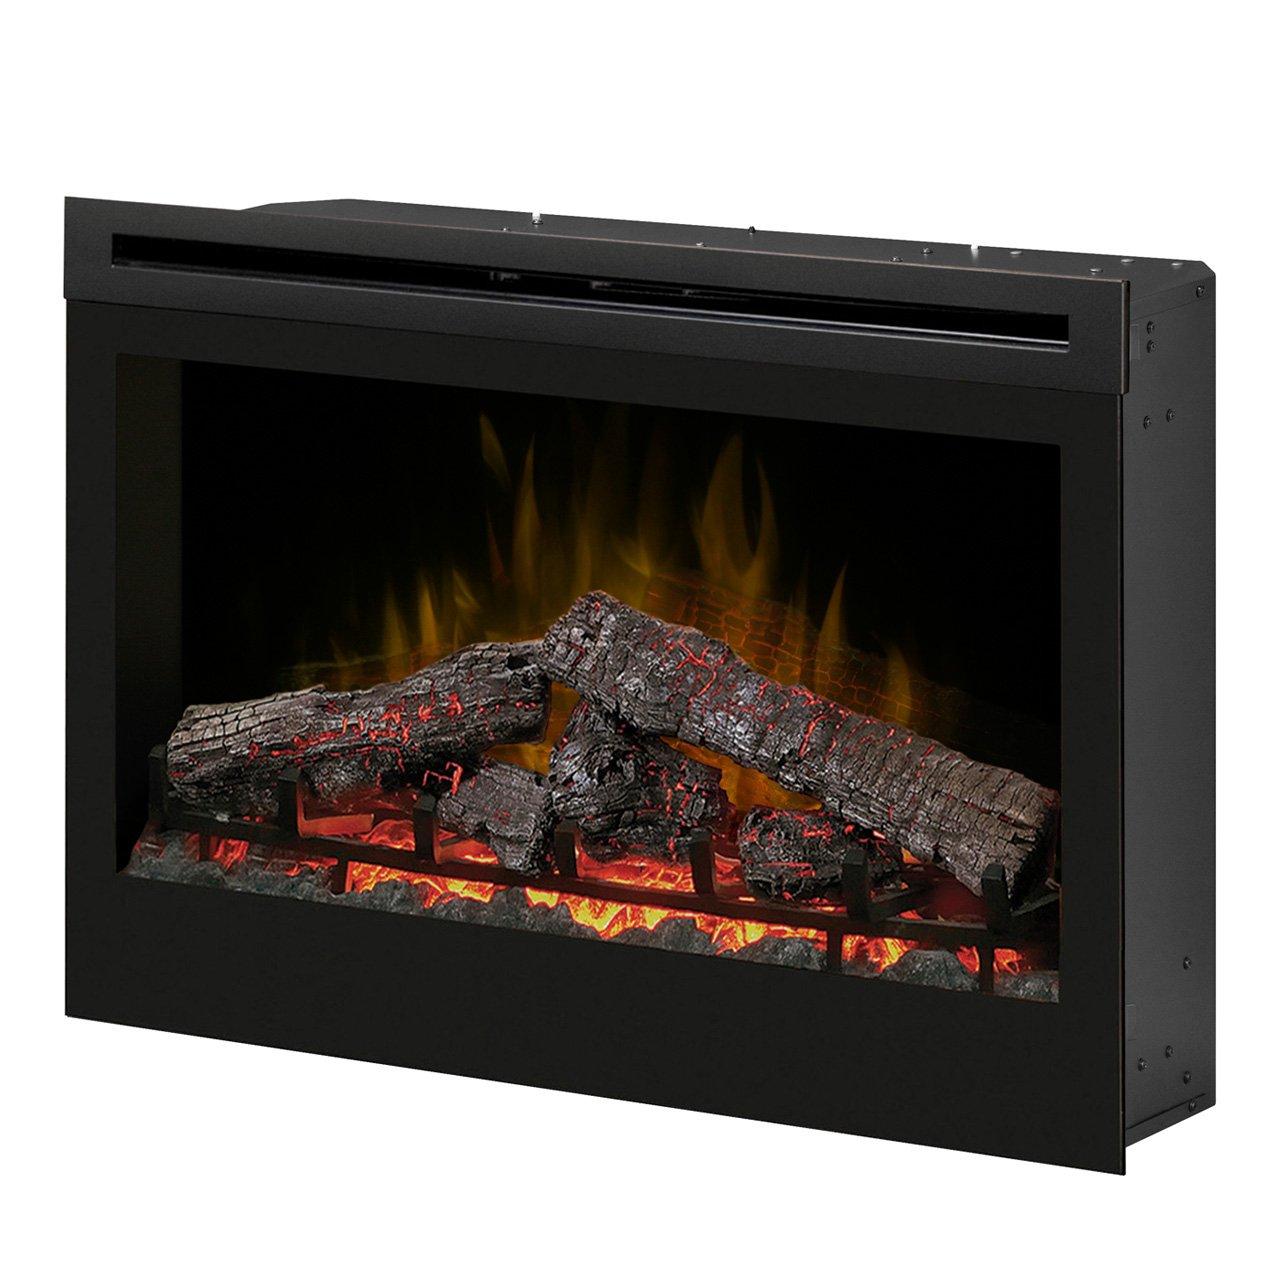 33 Electric Fireplace Insert Fresh Dimplex Df3033st 33 Inch Self Trimming Electric Fireplace Insert